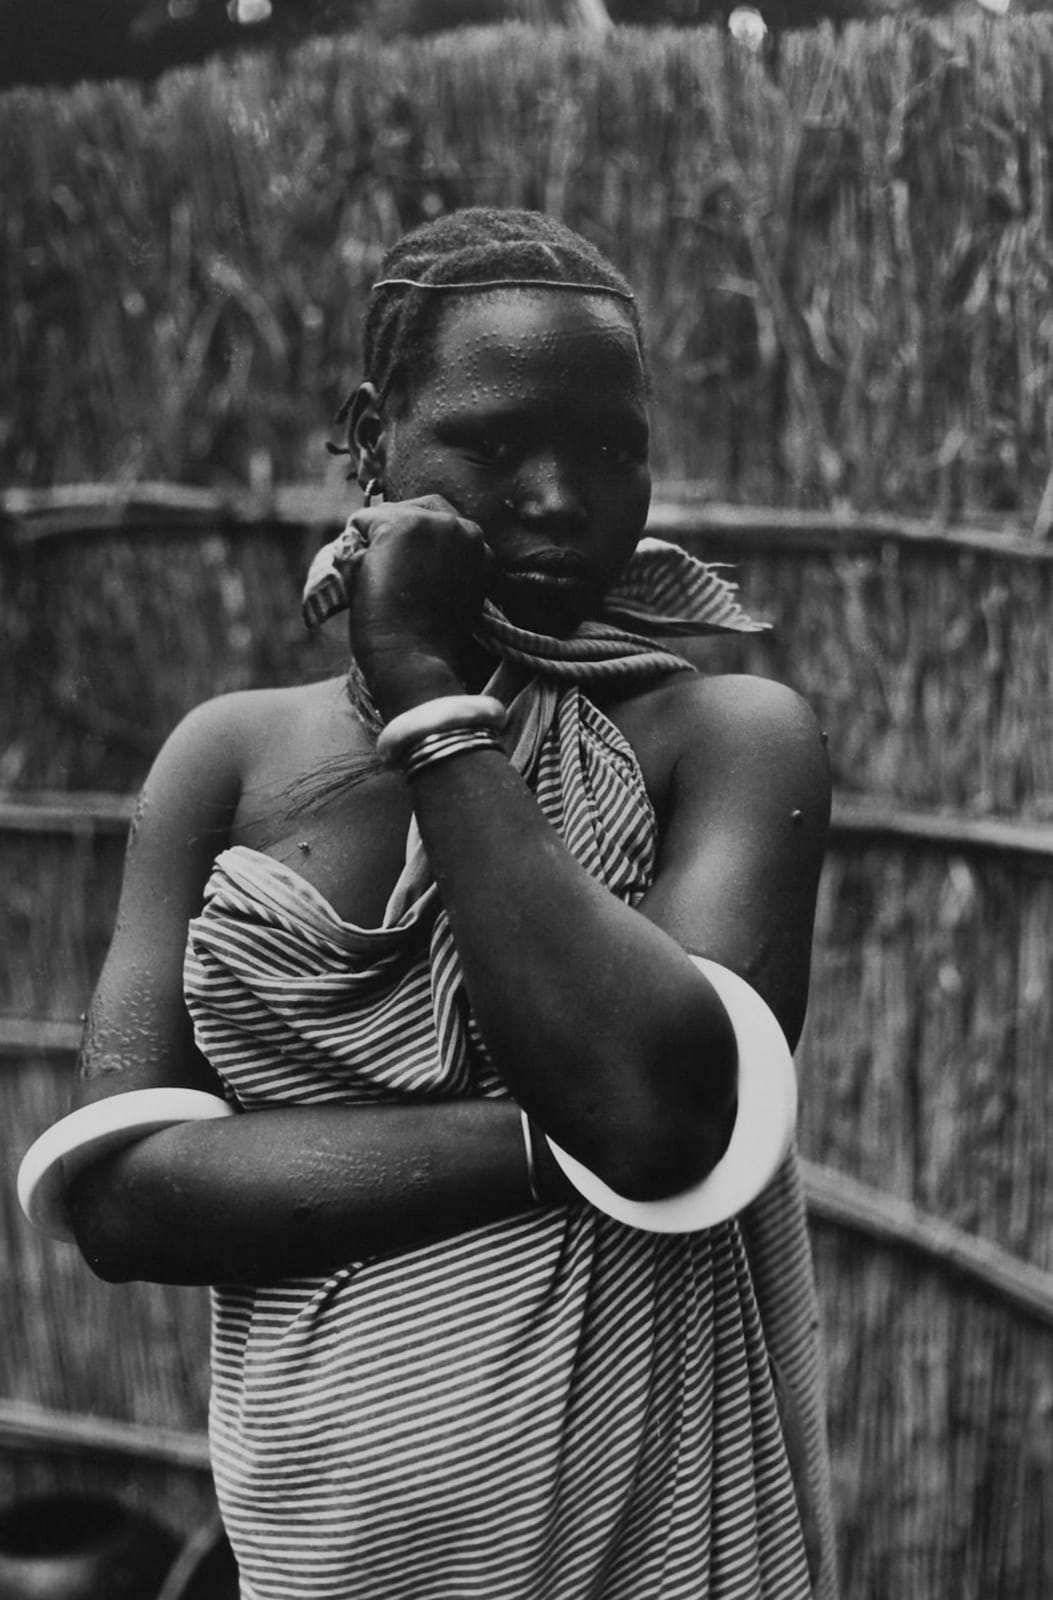 Ming Smith, Cicatrice Cosmetique, Gambela, Ethiopia, 1973